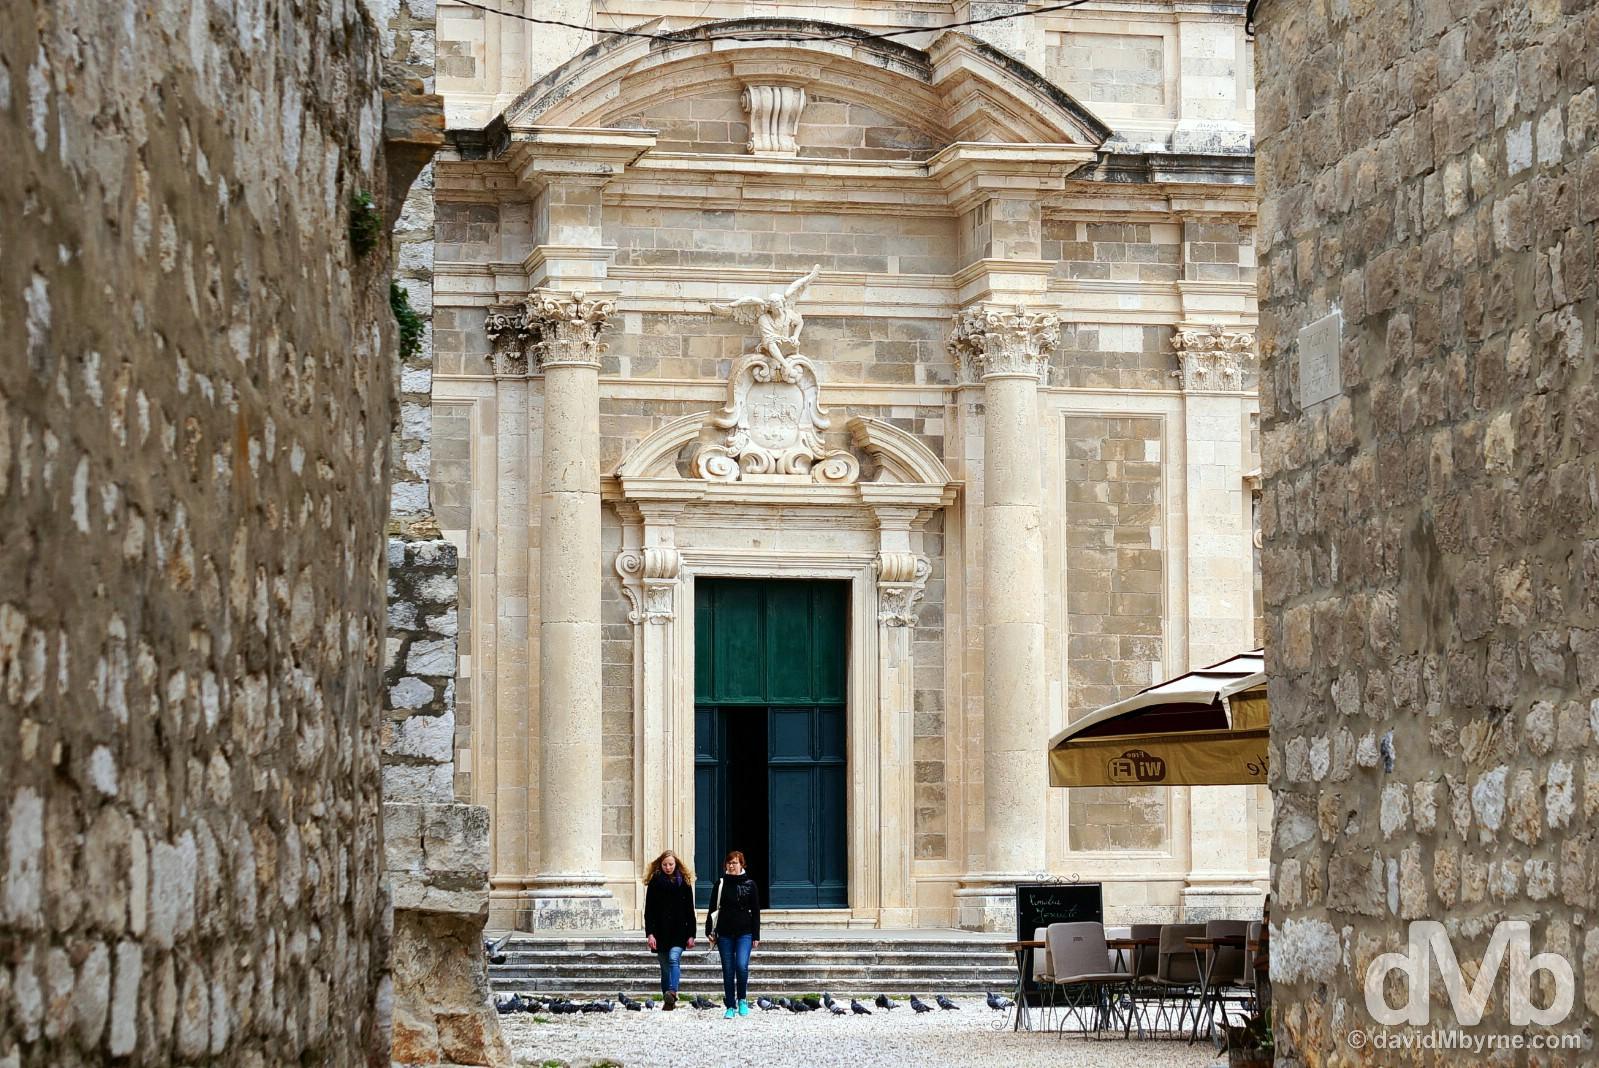 Jesuit Monastery, Old Town, Dubrovnik, Croatia. April 7, 2015.